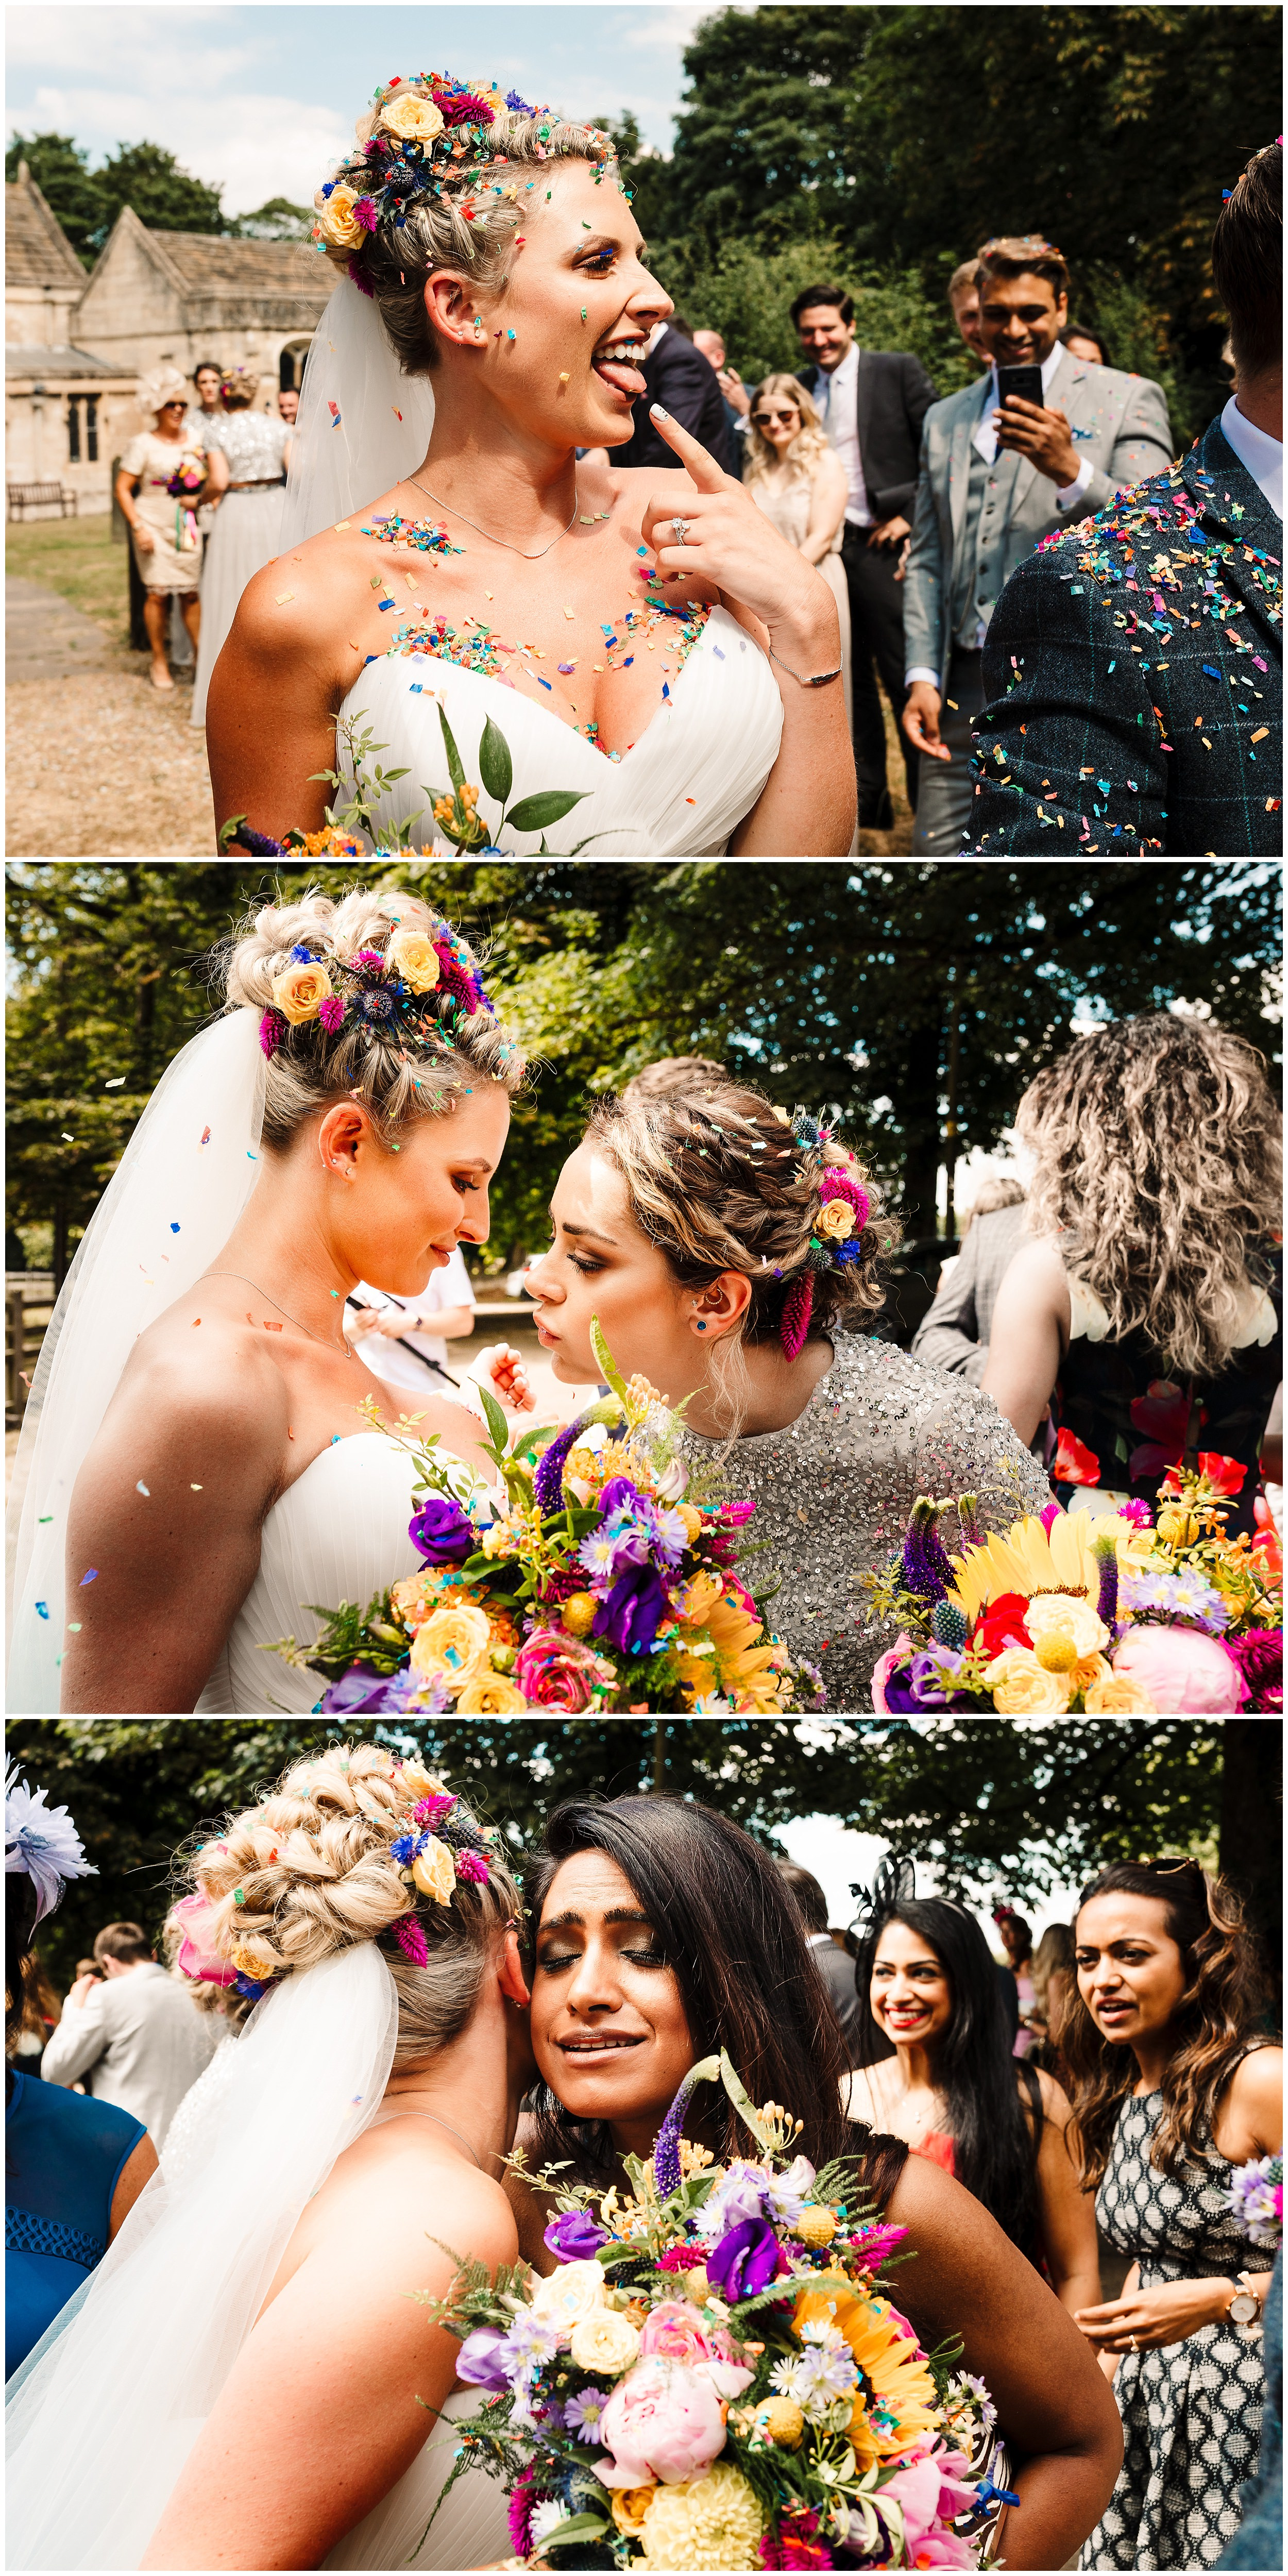 A Yorkshire bride covered in colourful wedding confetti